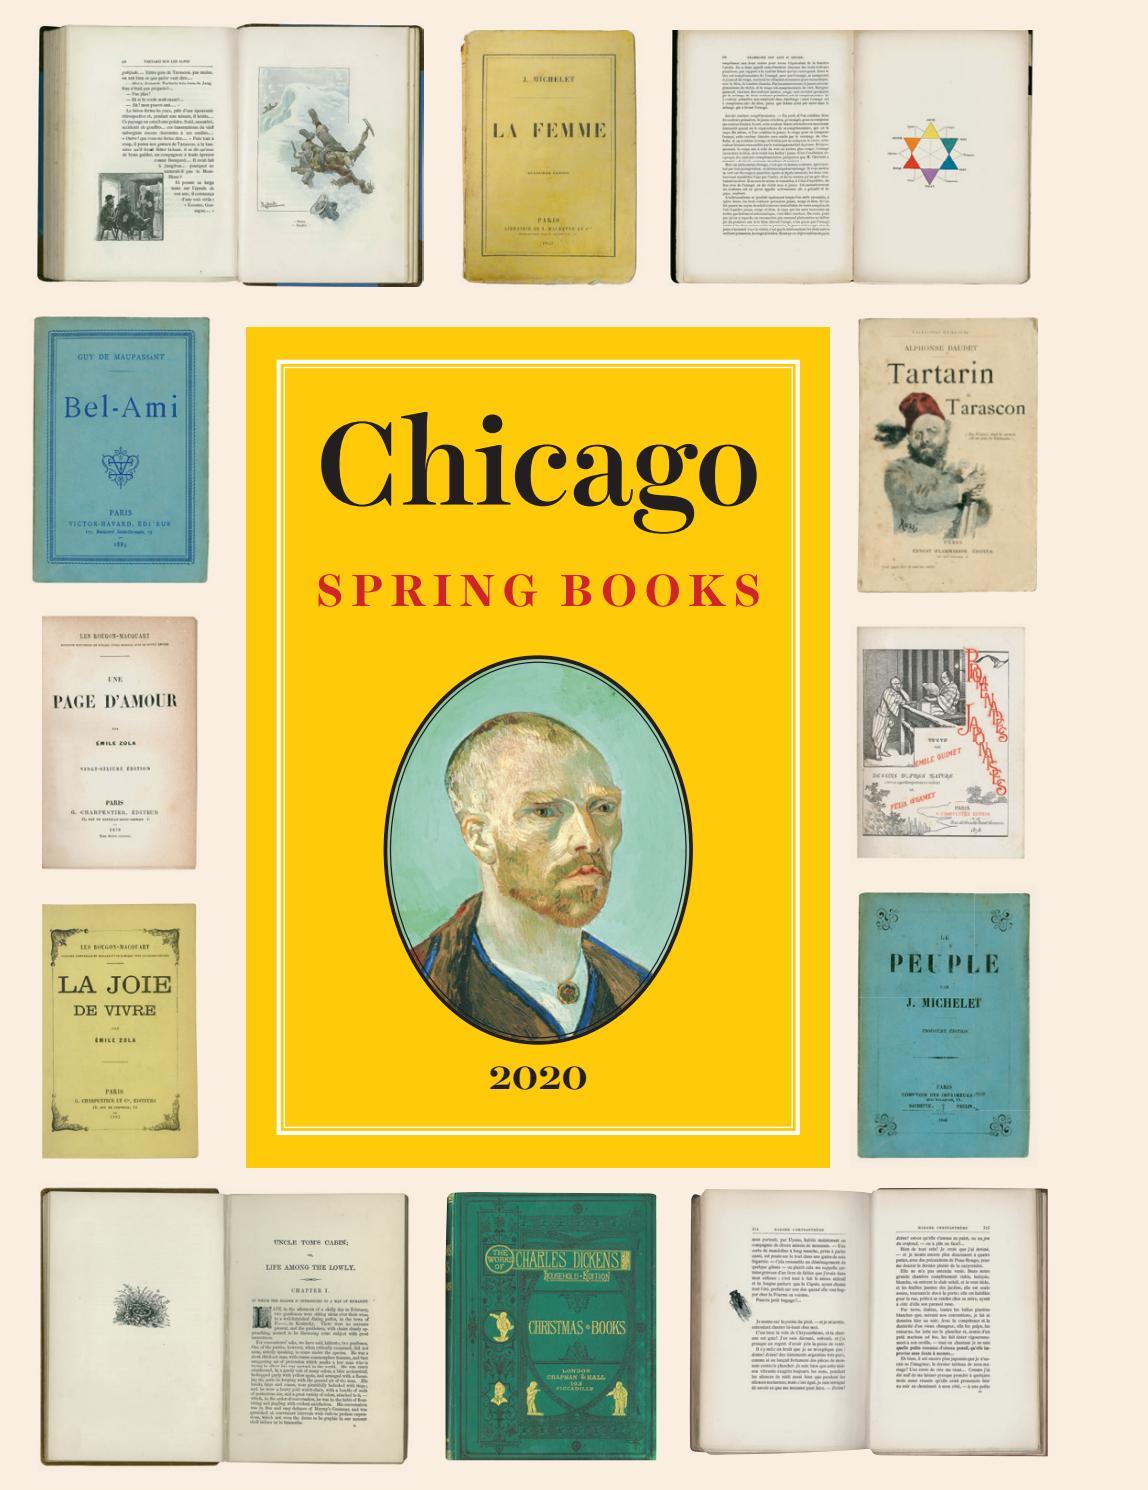 University Of Chicago Press Spring 2020 Seasonal Catalog